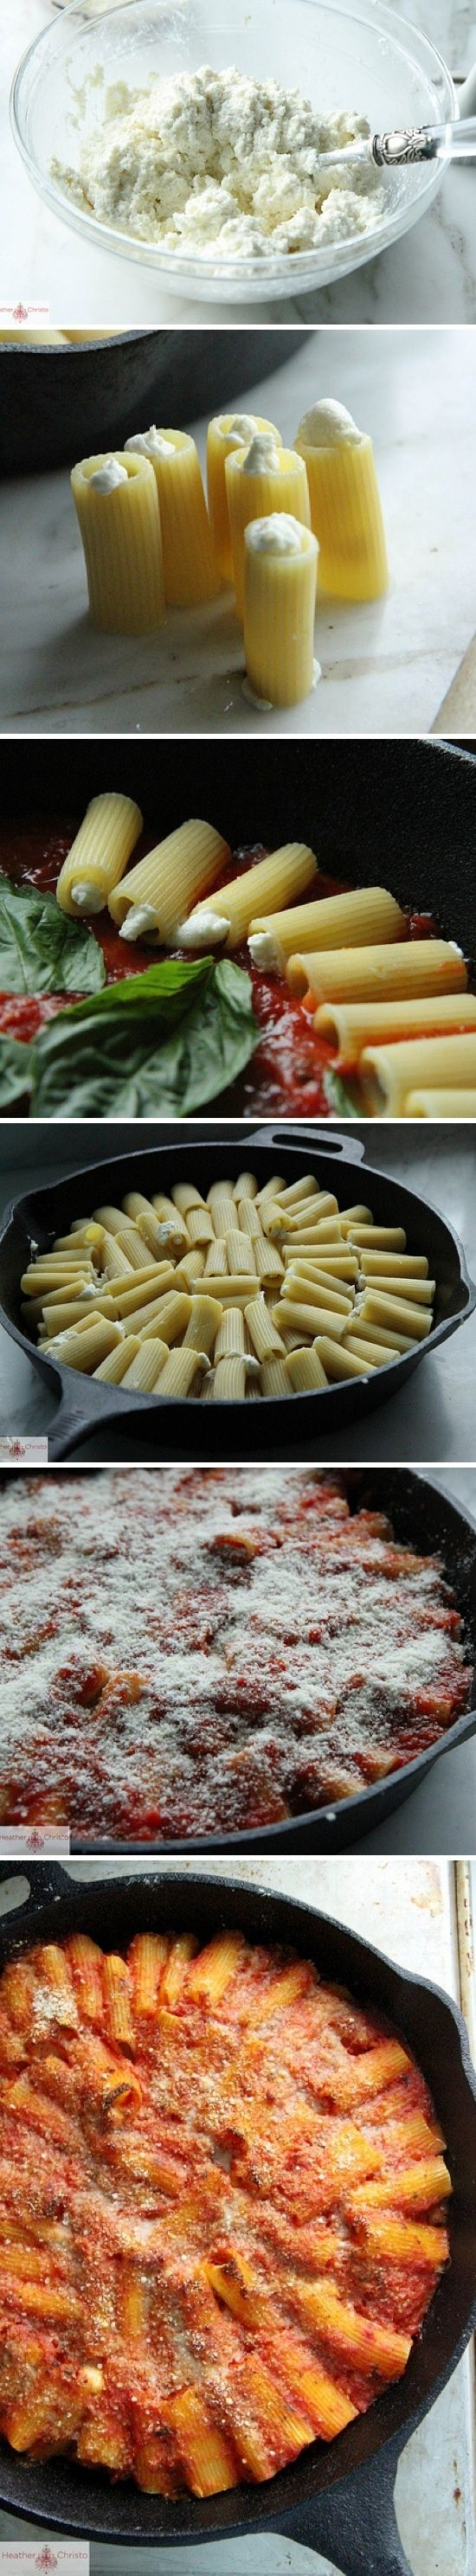 Skillet Baked Stuffed Rigatoni | Recipe By | http ...